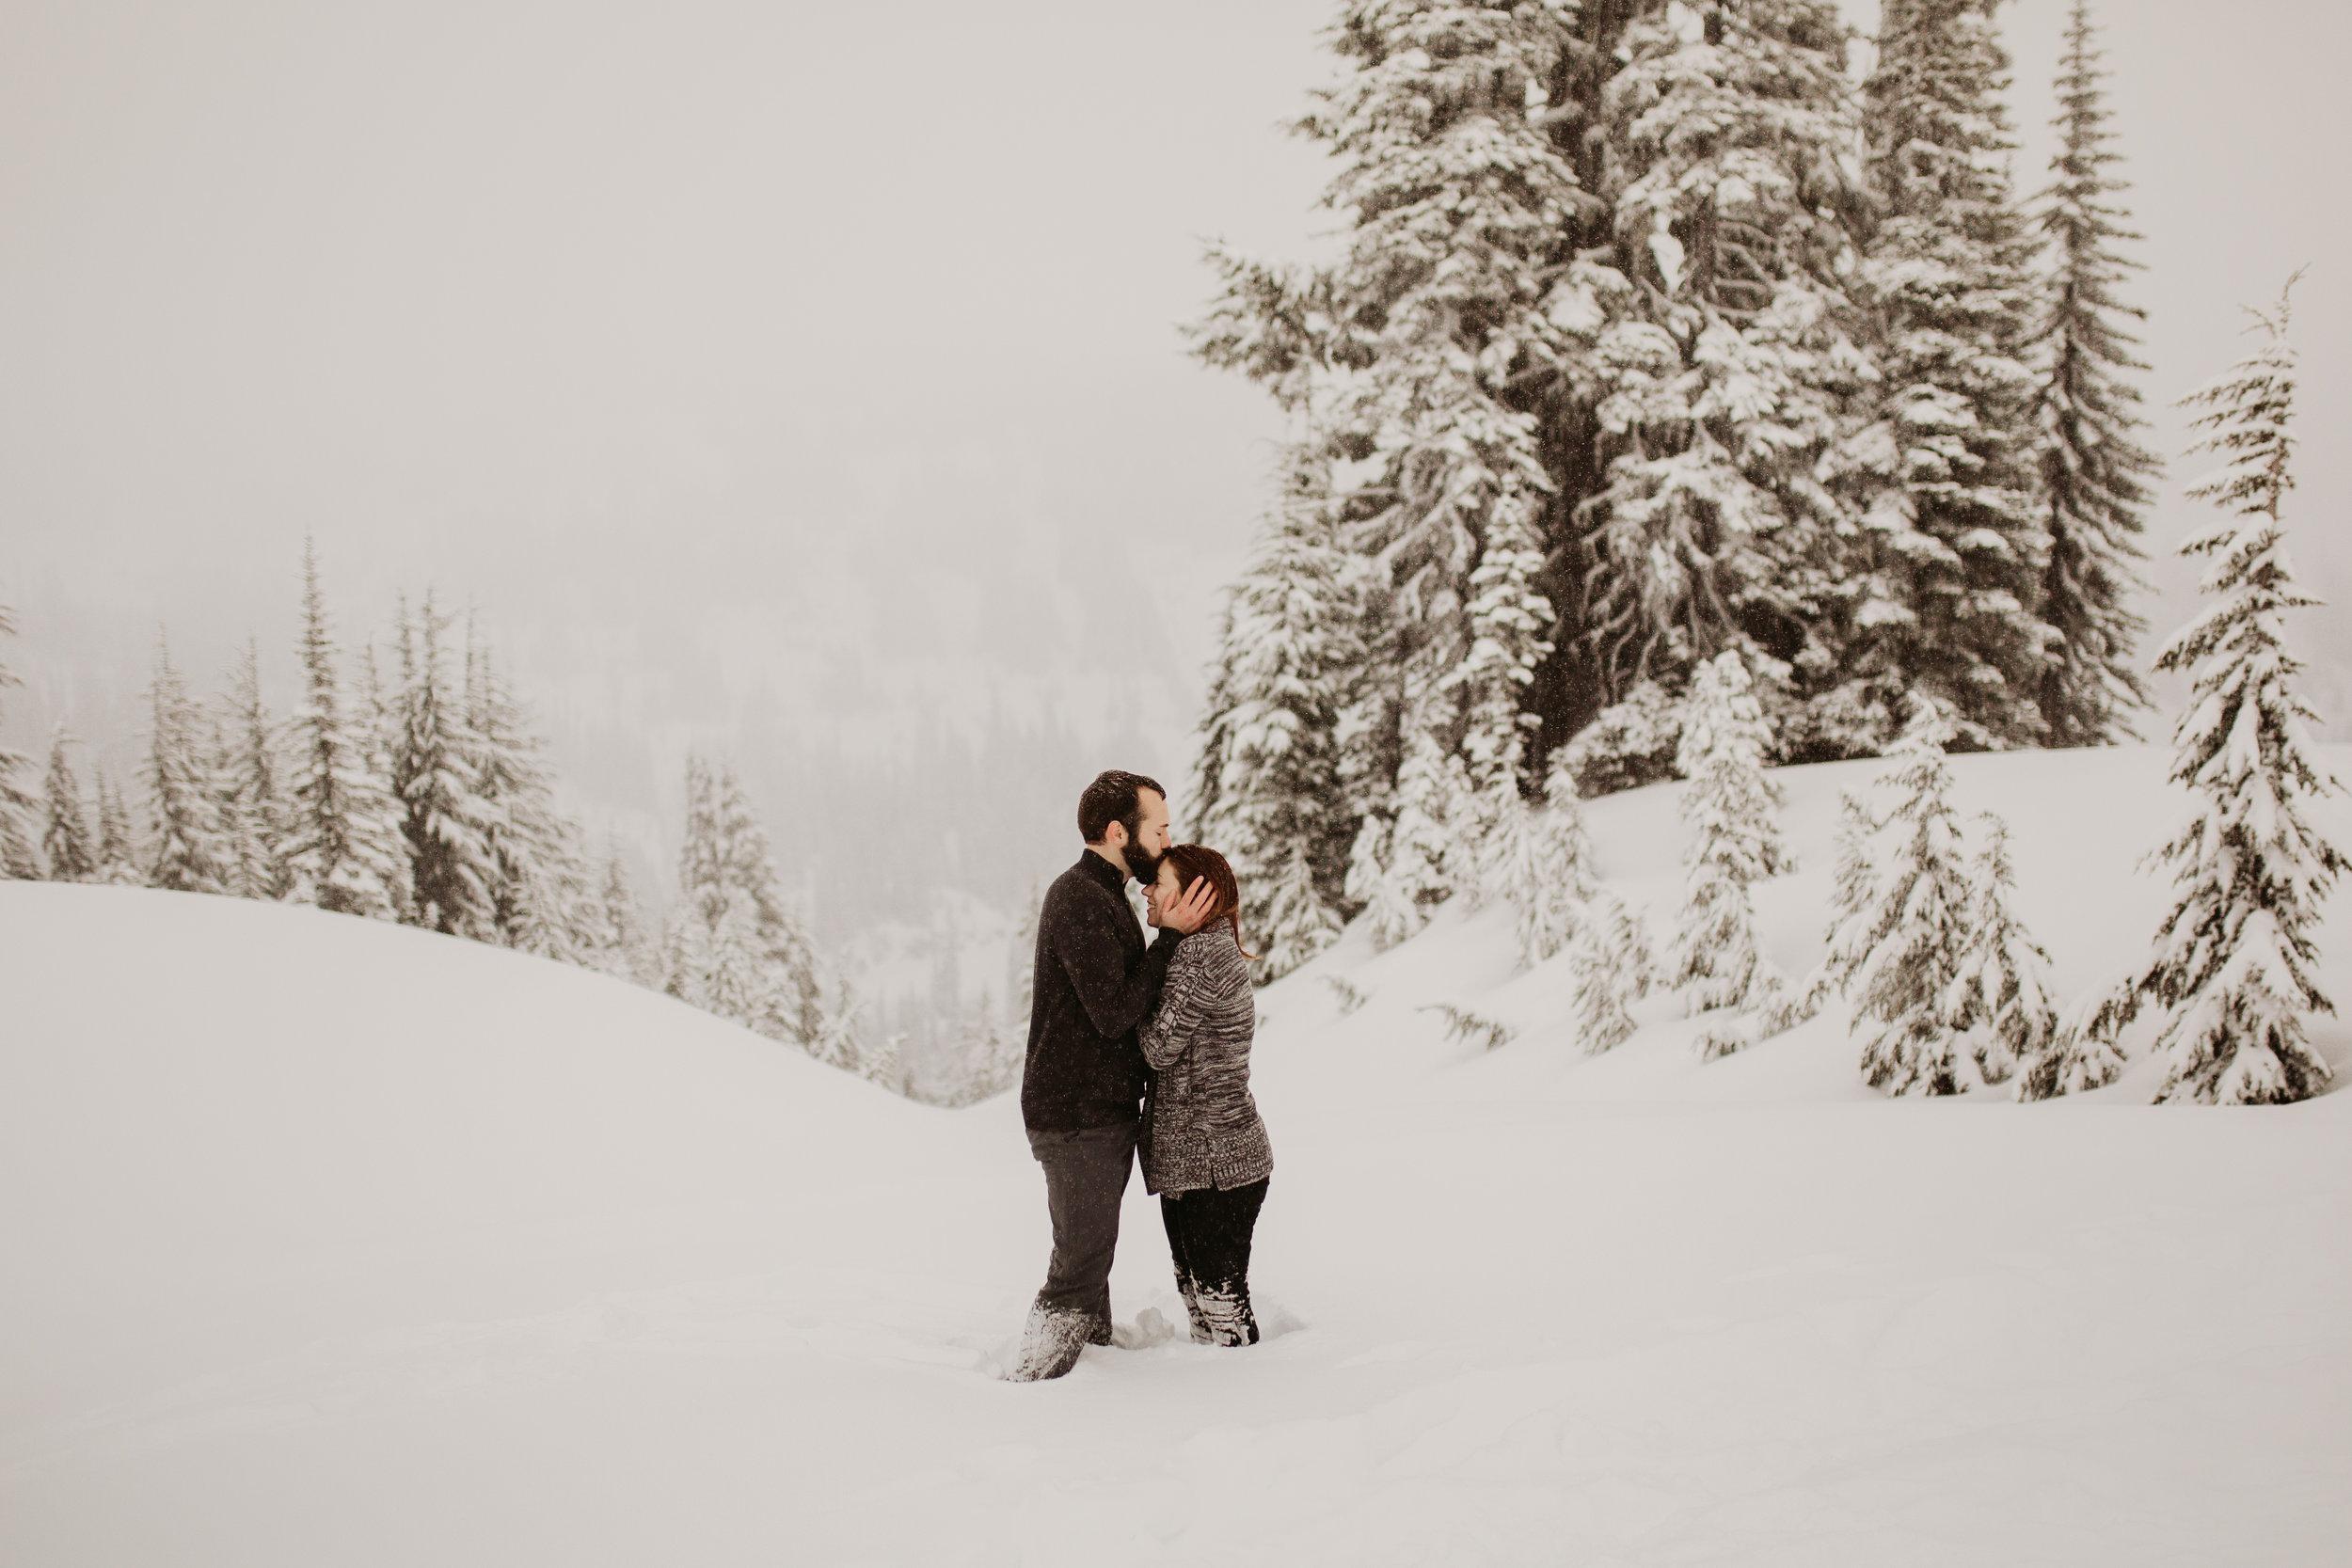 pnw_washington_oregon_elopement_mount_rainer_engagement_wedding_photographer24.jpg